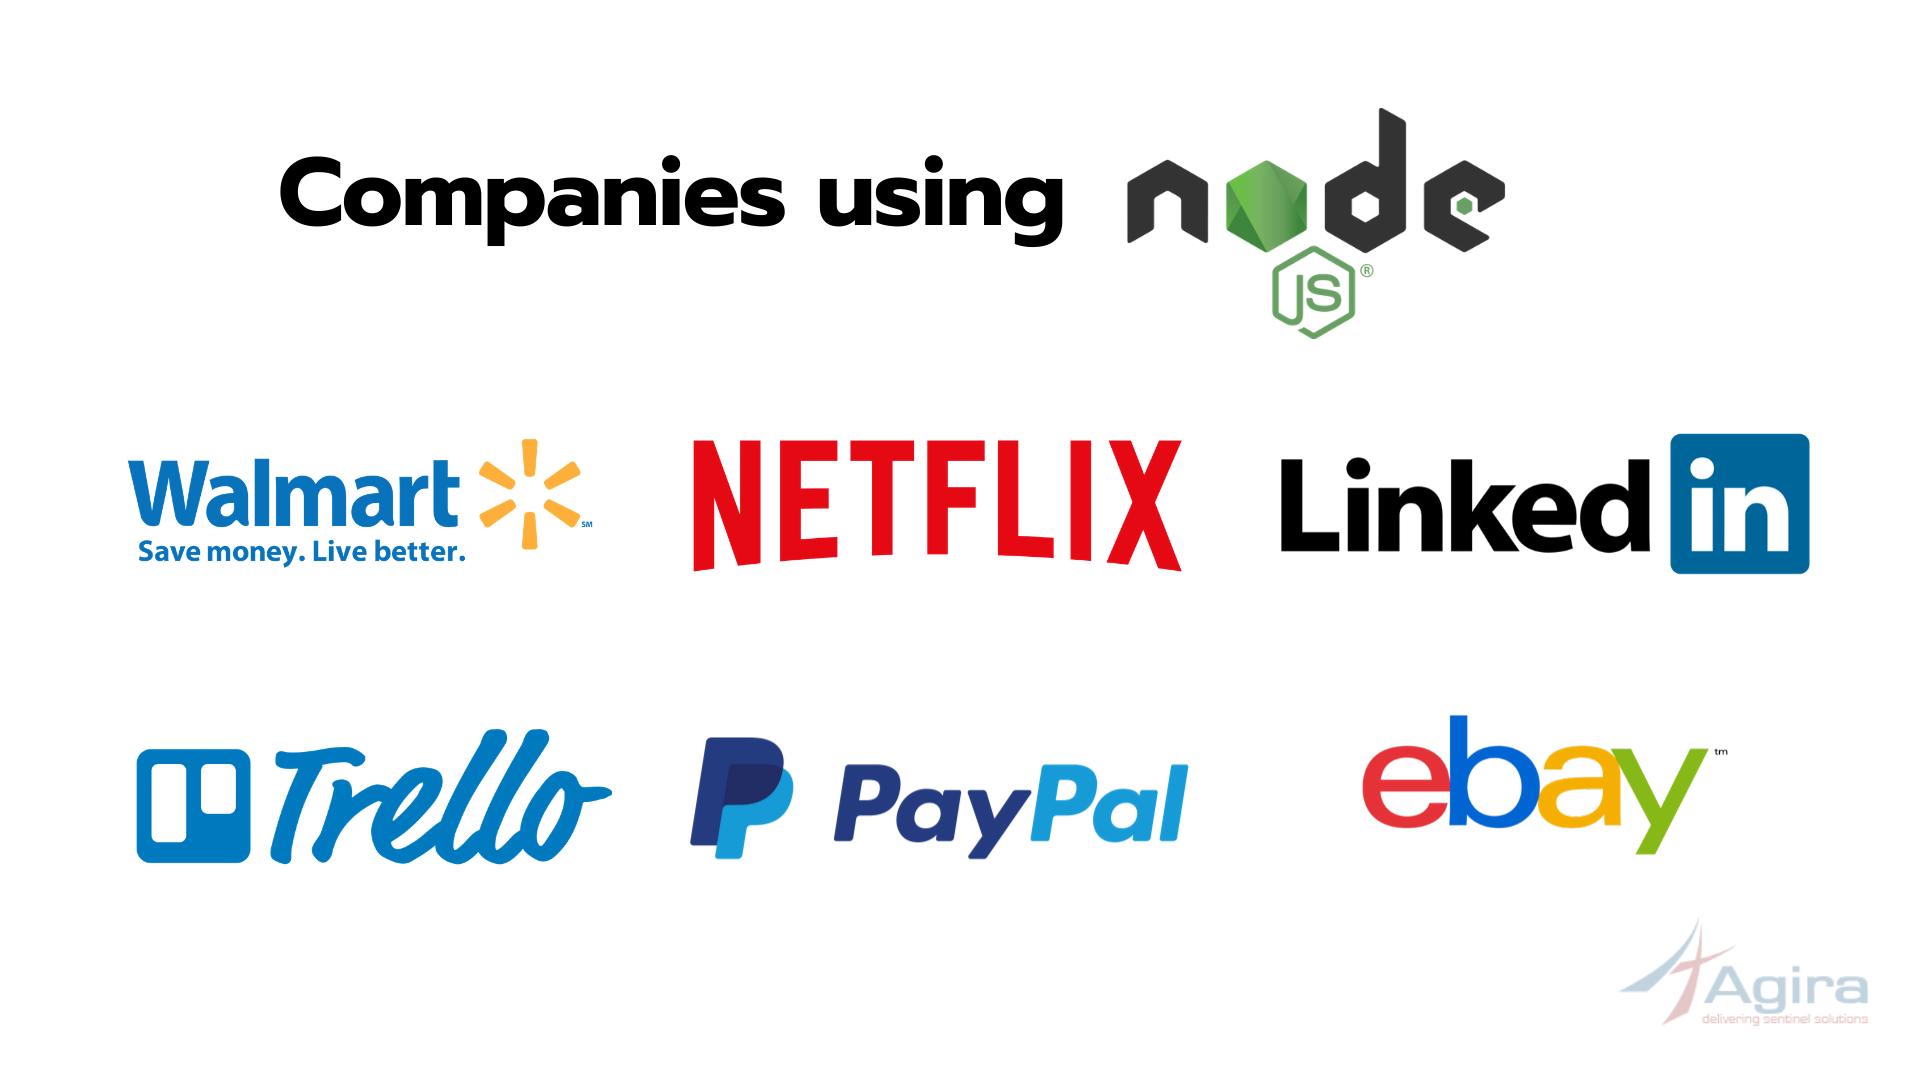 companies that use Nodejs